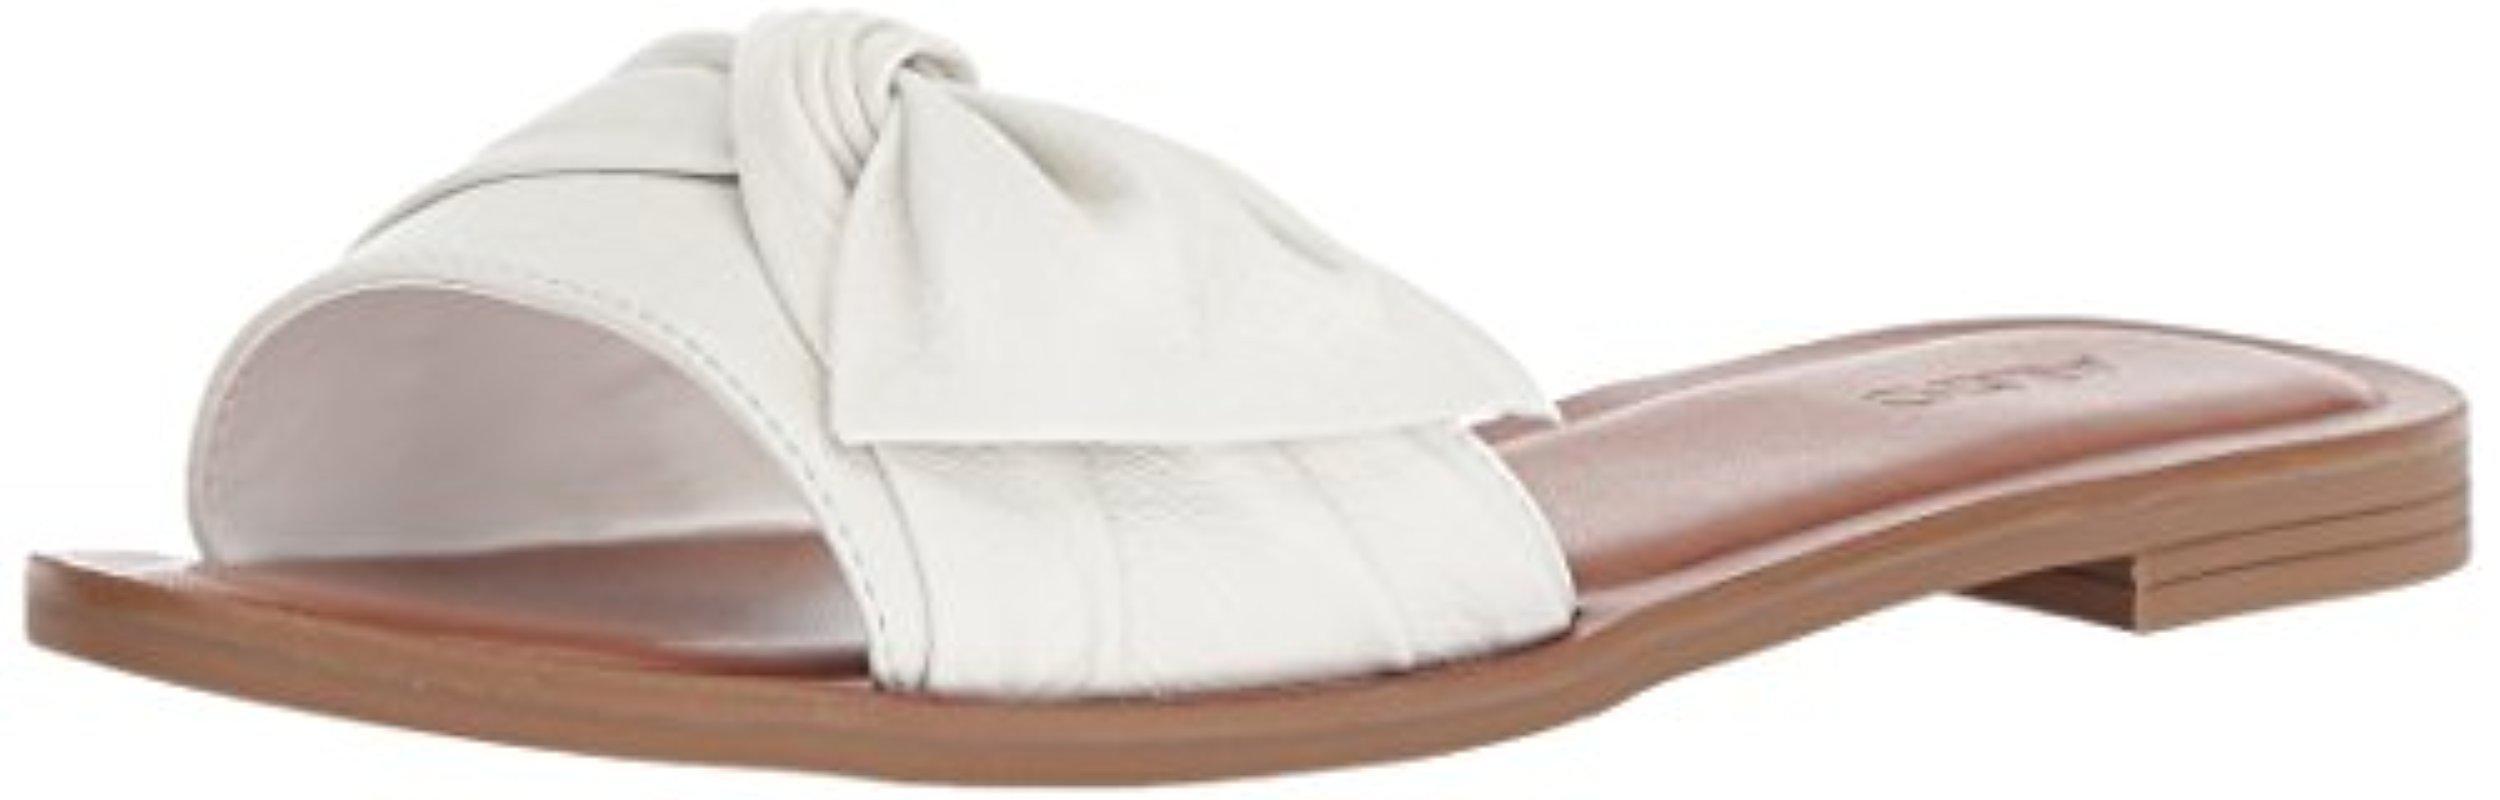 bc4c2afbf206 Lyst - ALDO Enroelia Slide Sandal in White